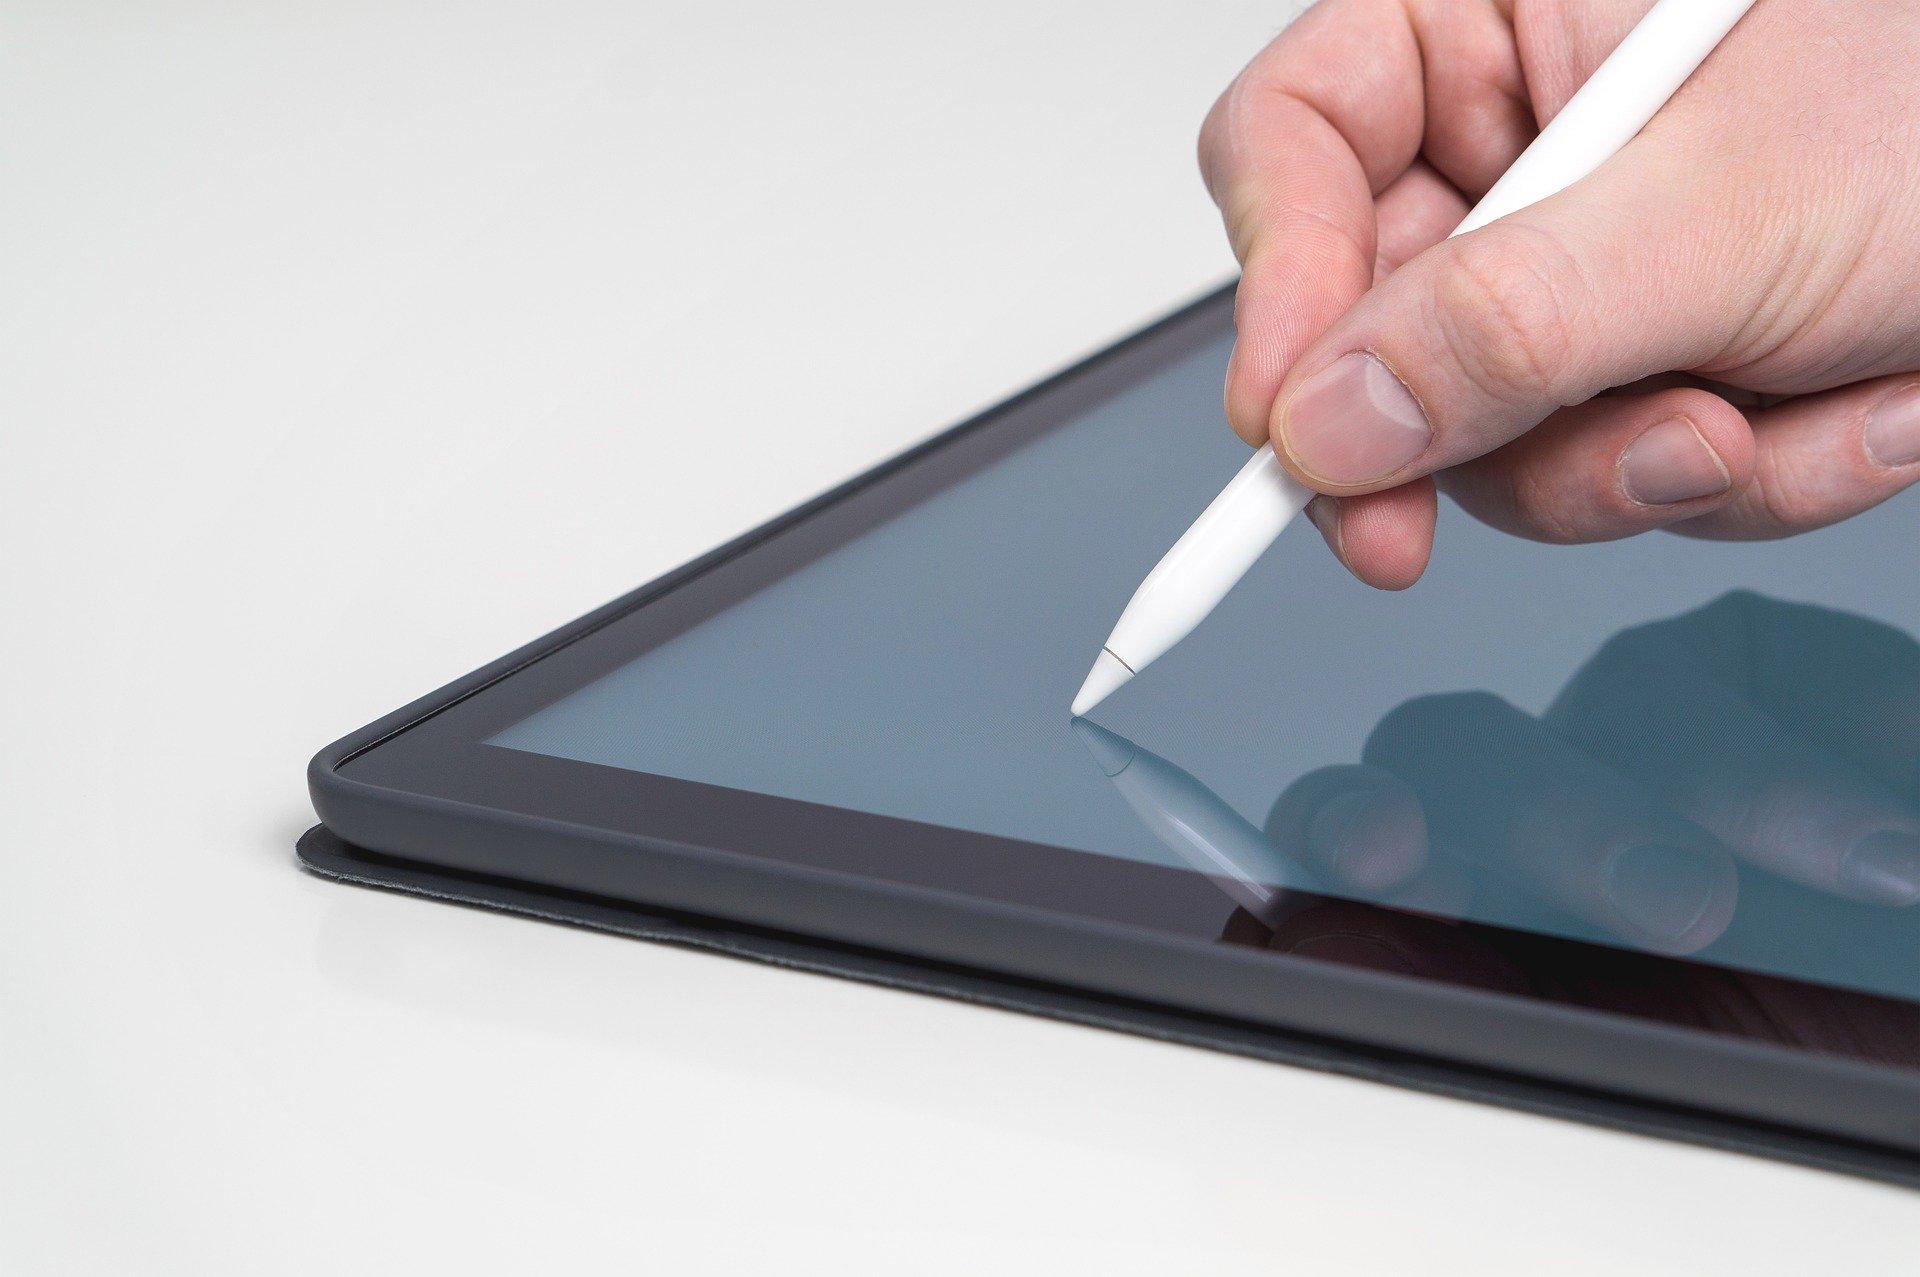 drawing tablets works well for artists. Black Bedroom Furniture Sets. Home Design Ideas